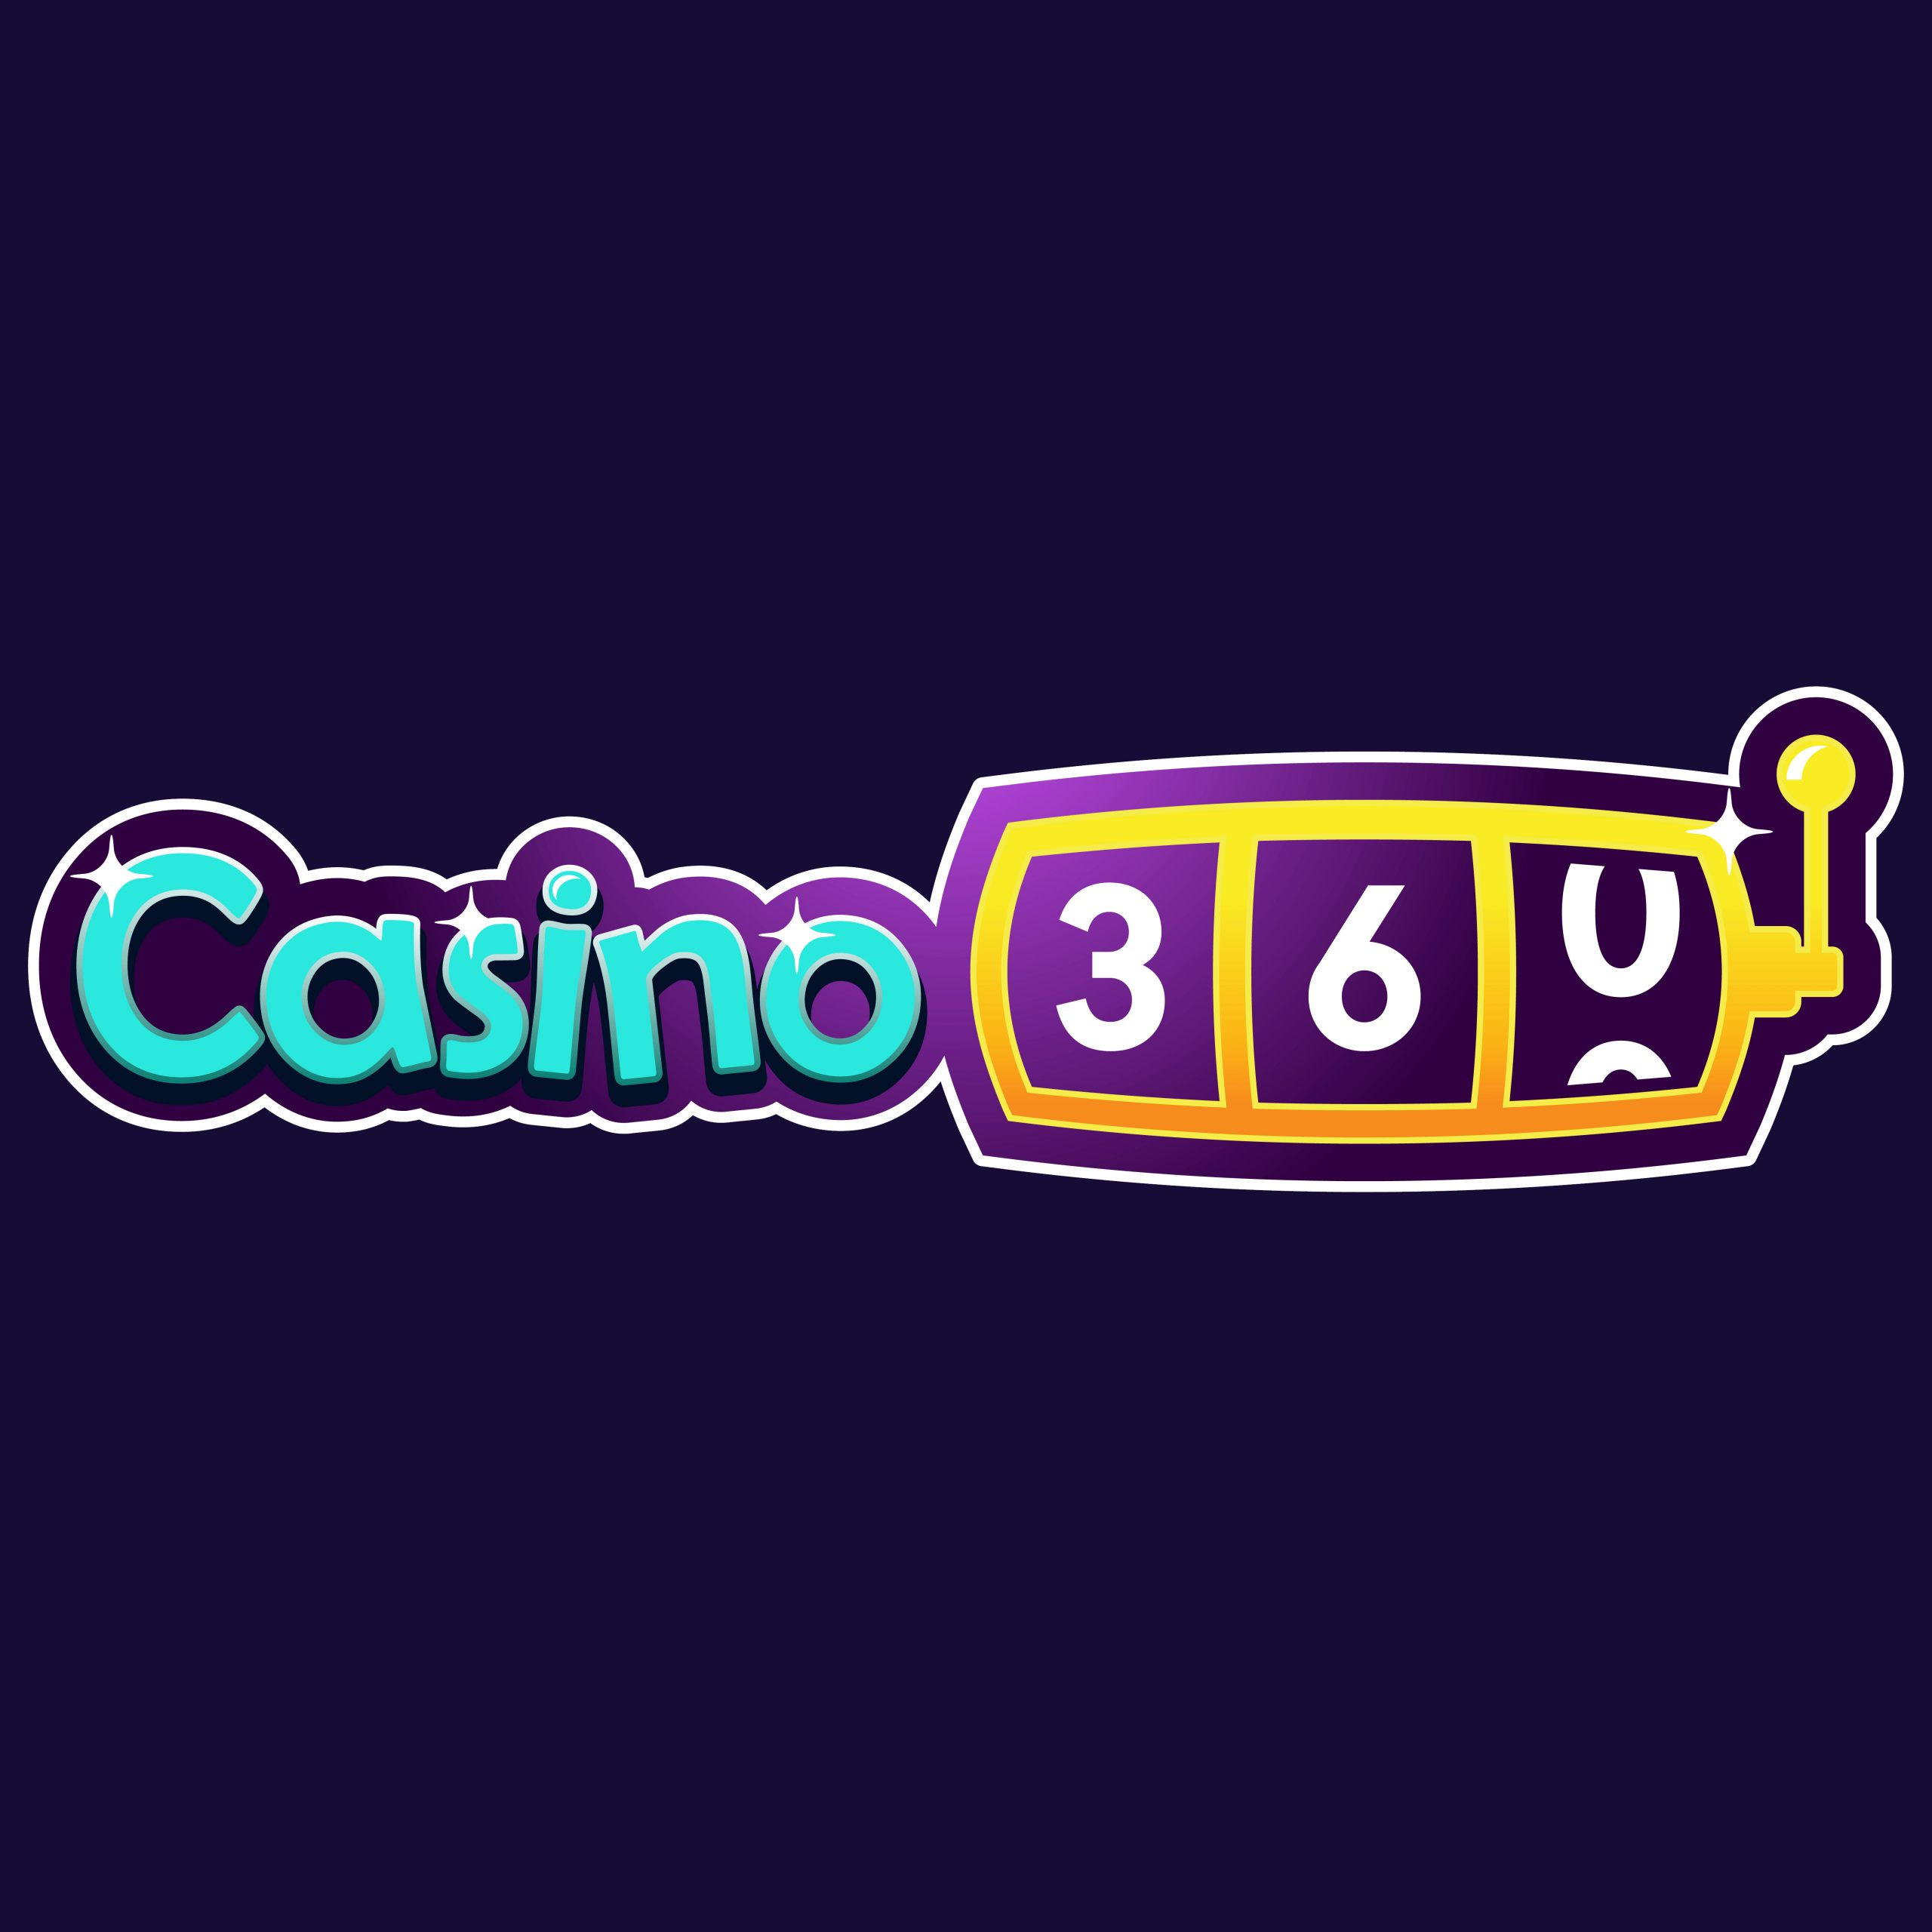 Casino360-logo